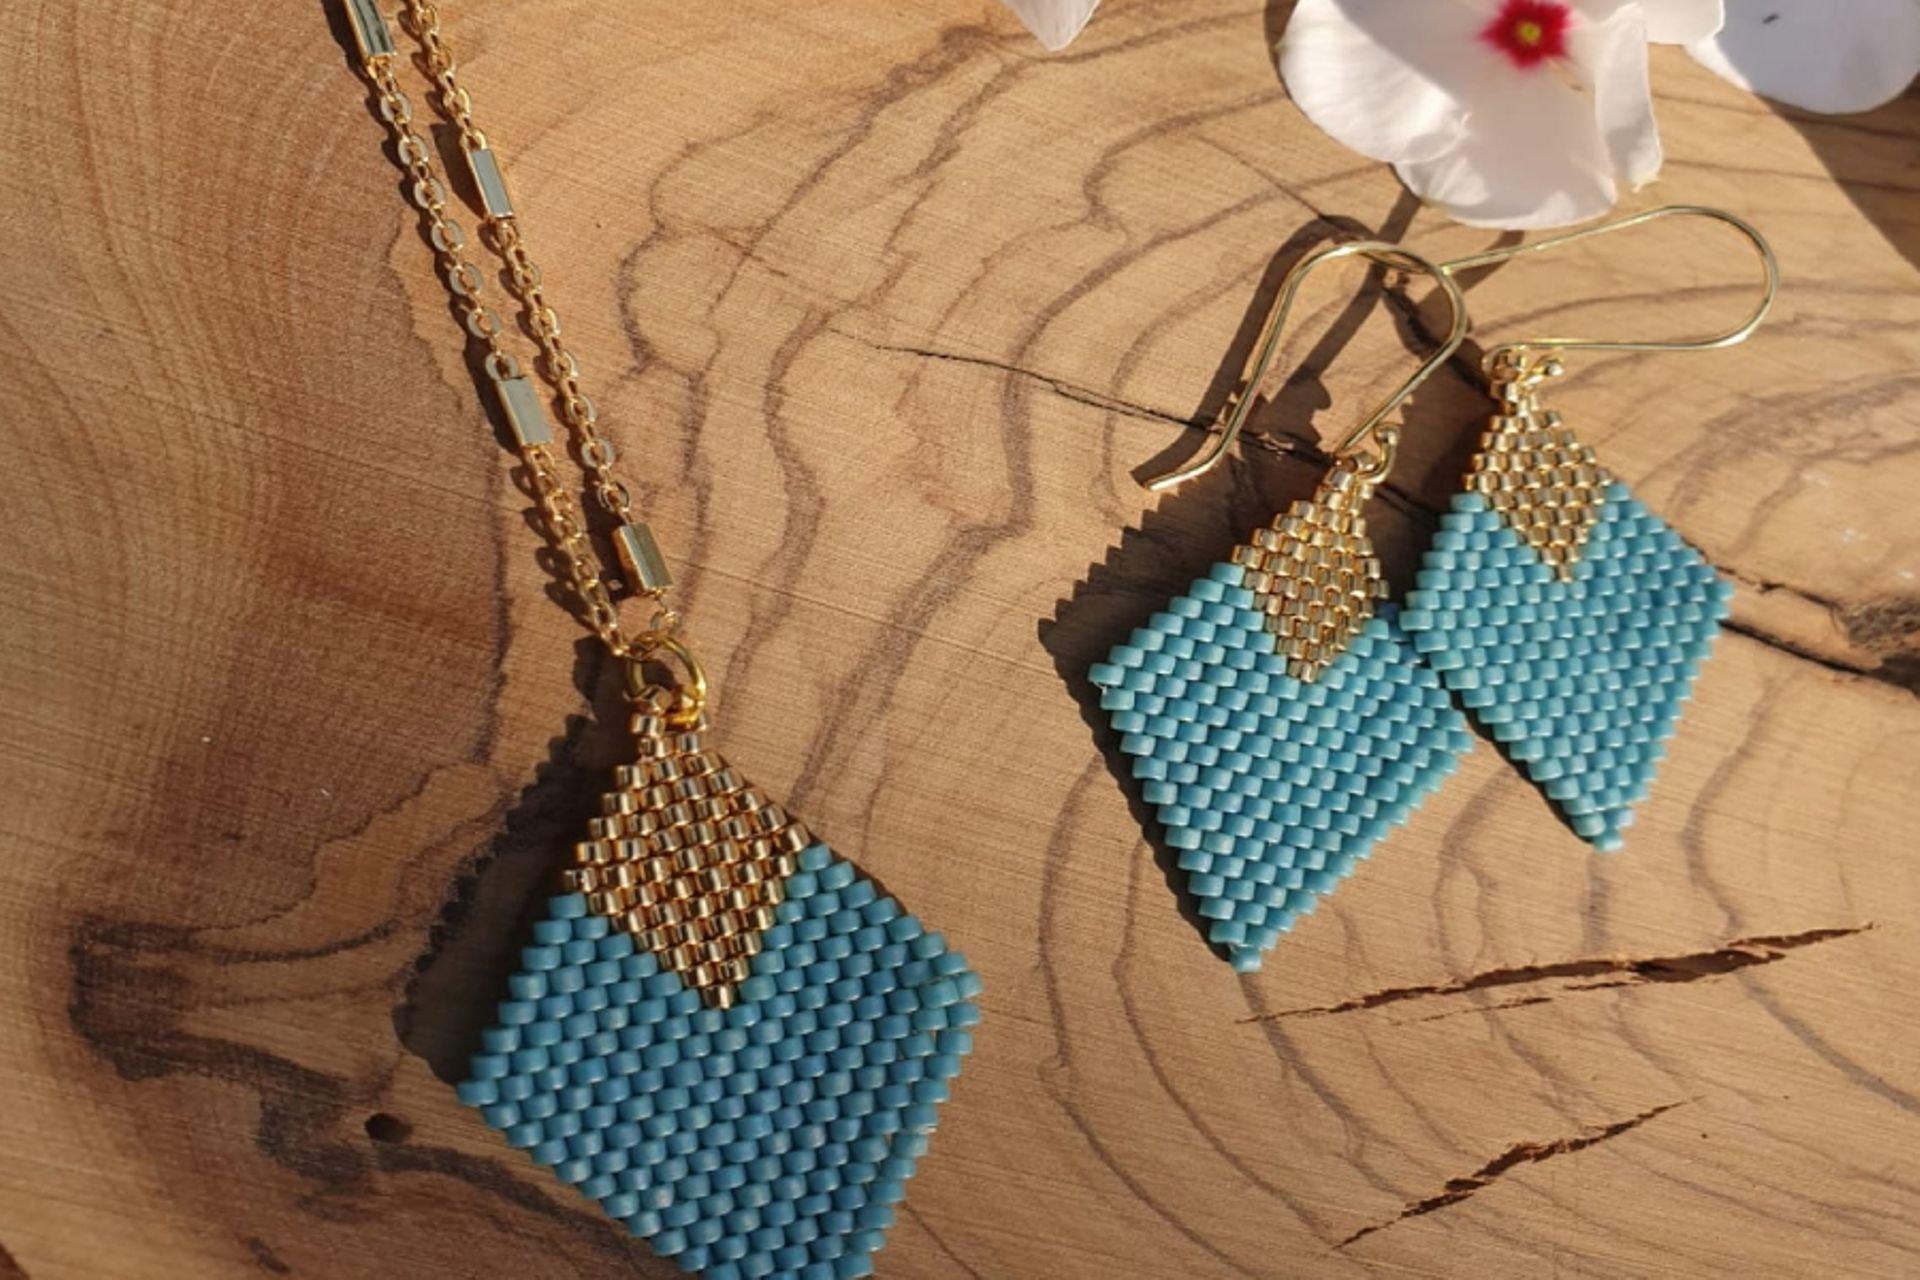 24 lantana beads jewelry designer תְמוּנָה